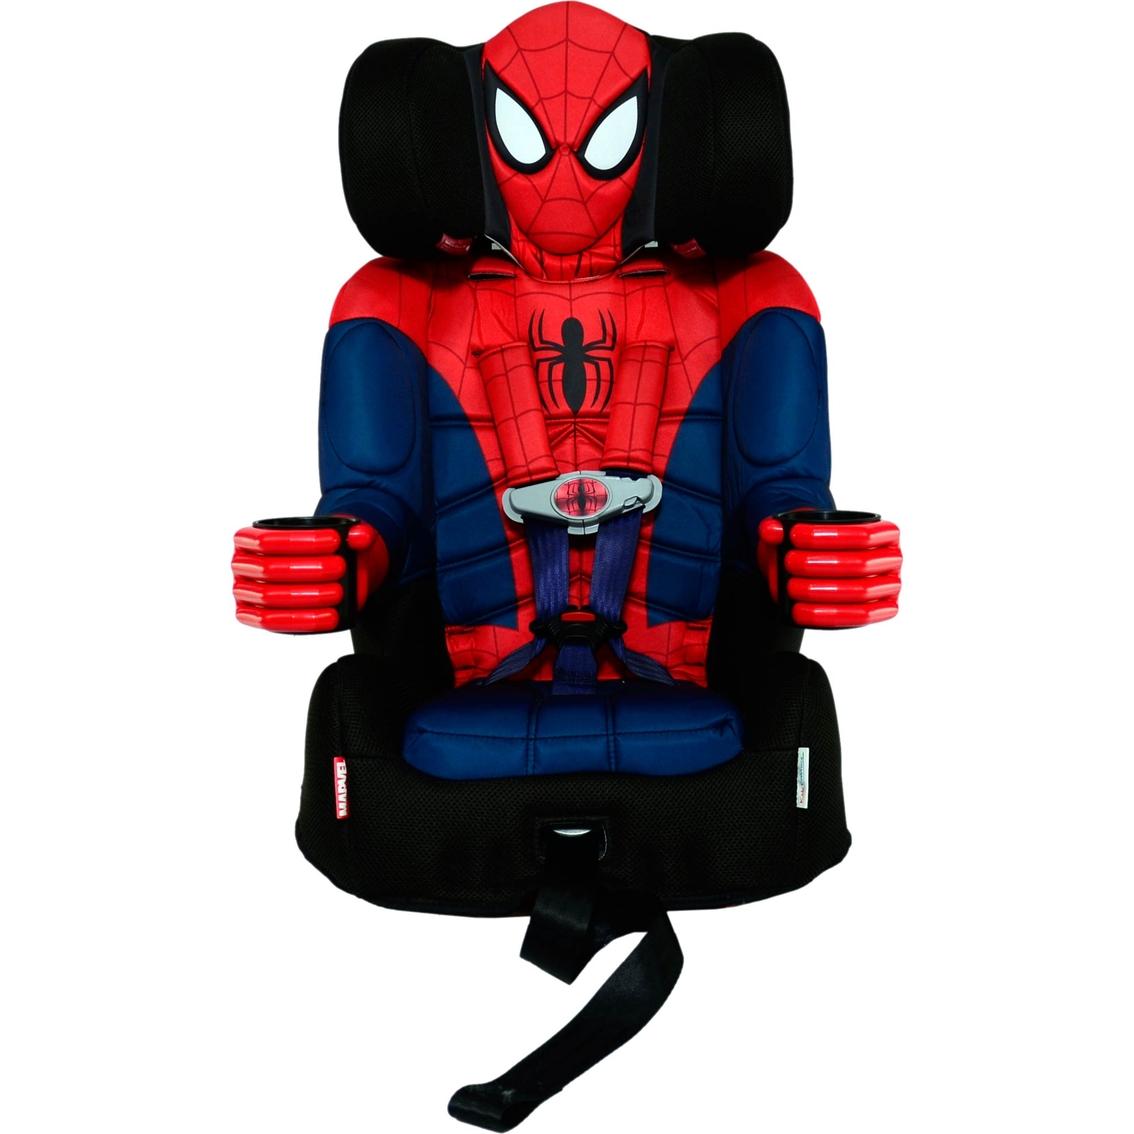 KidsEmbrace Spider Man Friendship Combination Booster Car Seat